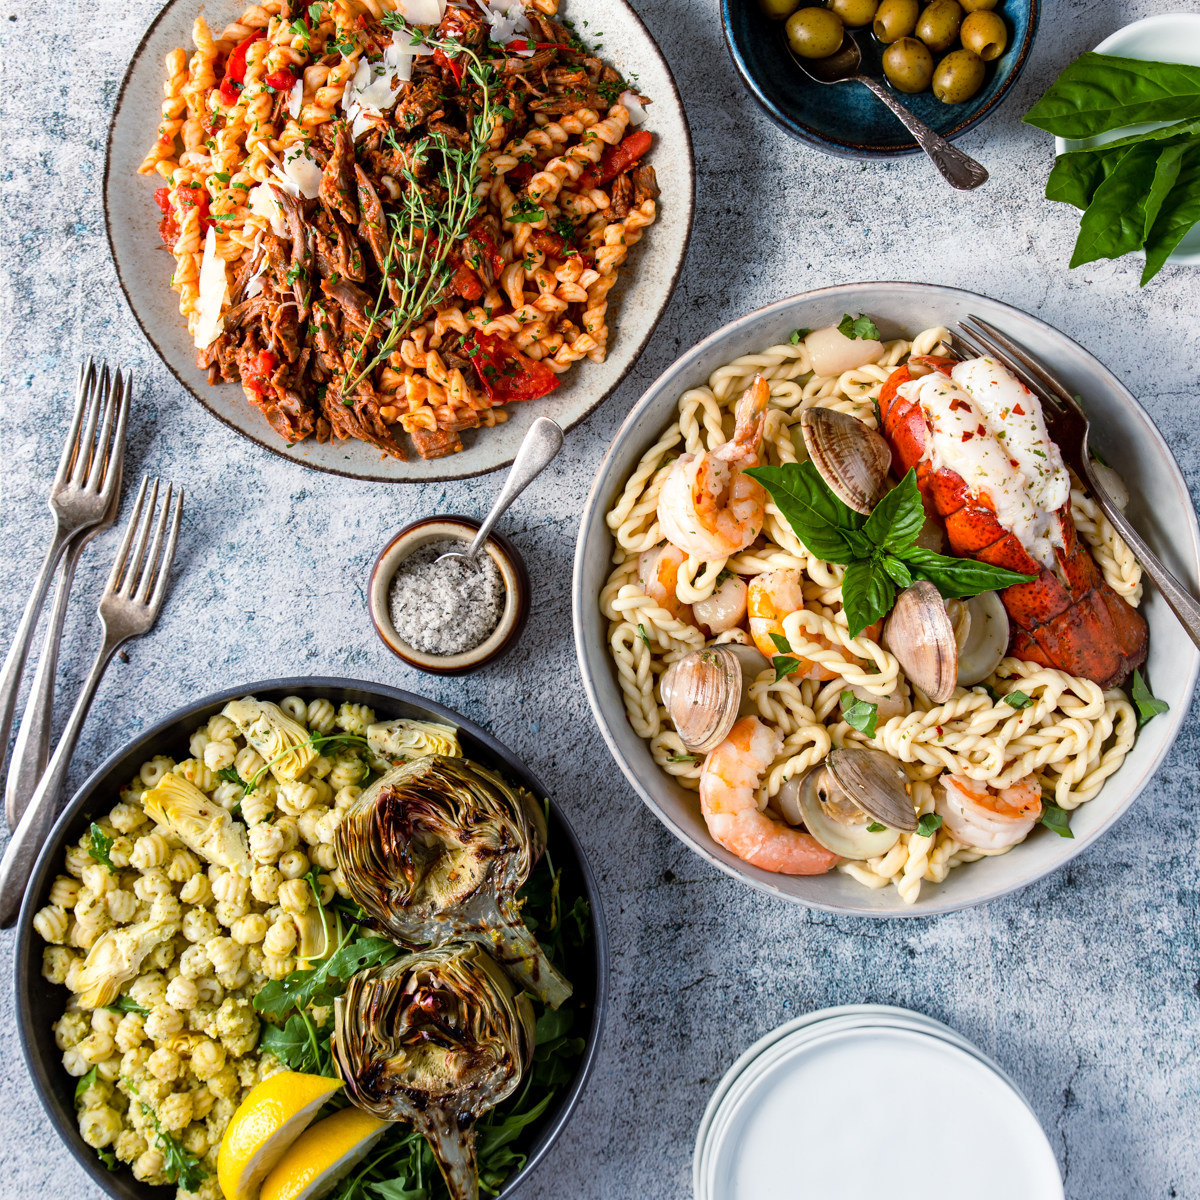 Sneak Peek of Sardinian Pasta Offerings